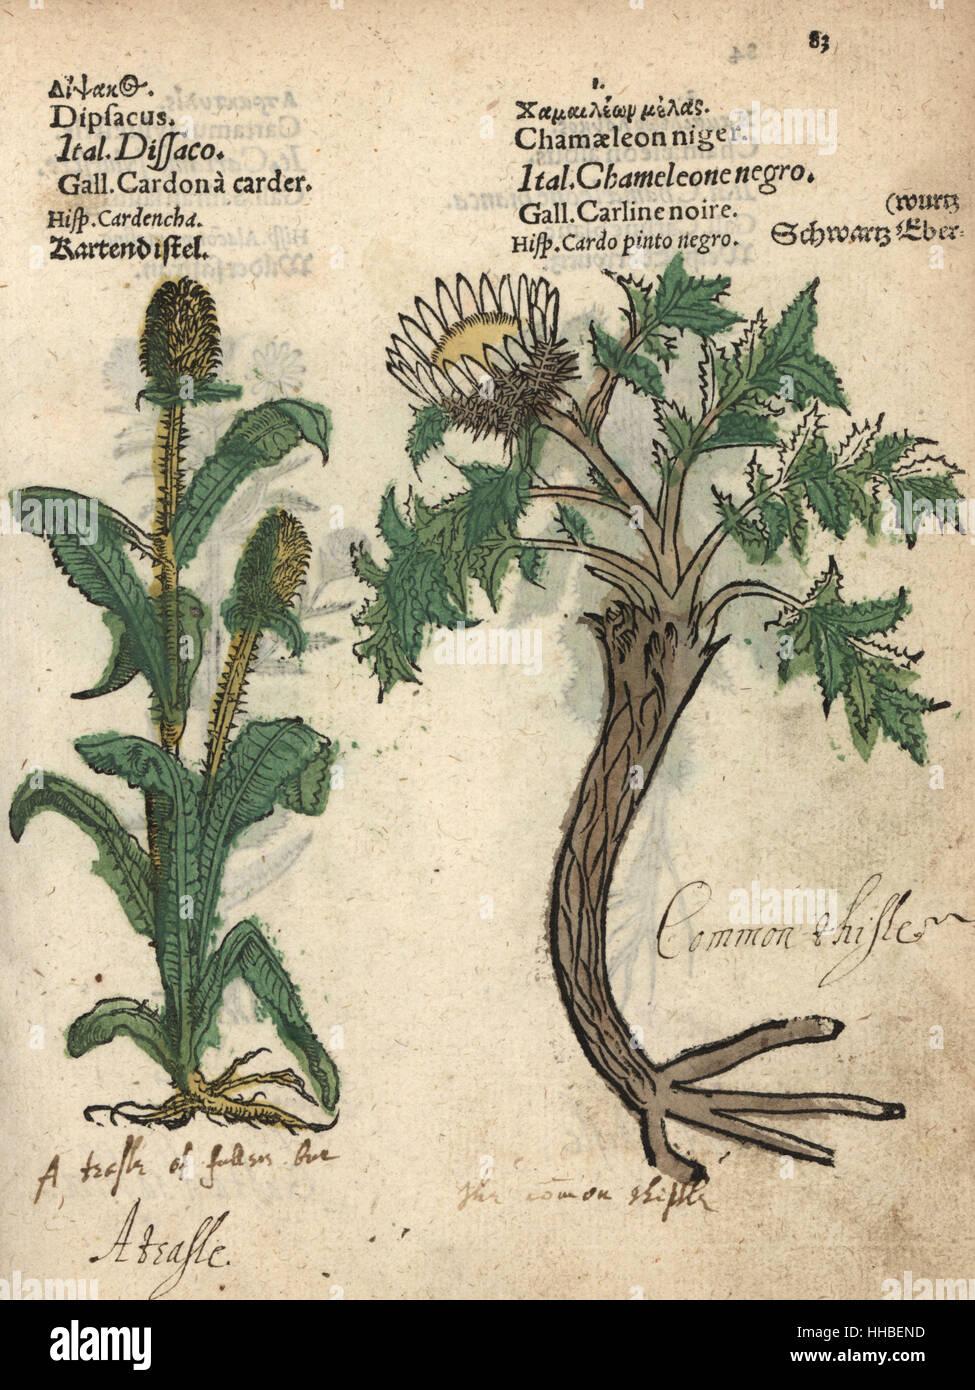 Teasel, Dipsacus fullonum, and pale globe thistle, Echinops sphaerocephalus. Handcoloured woodblock engraving of - Stock Image